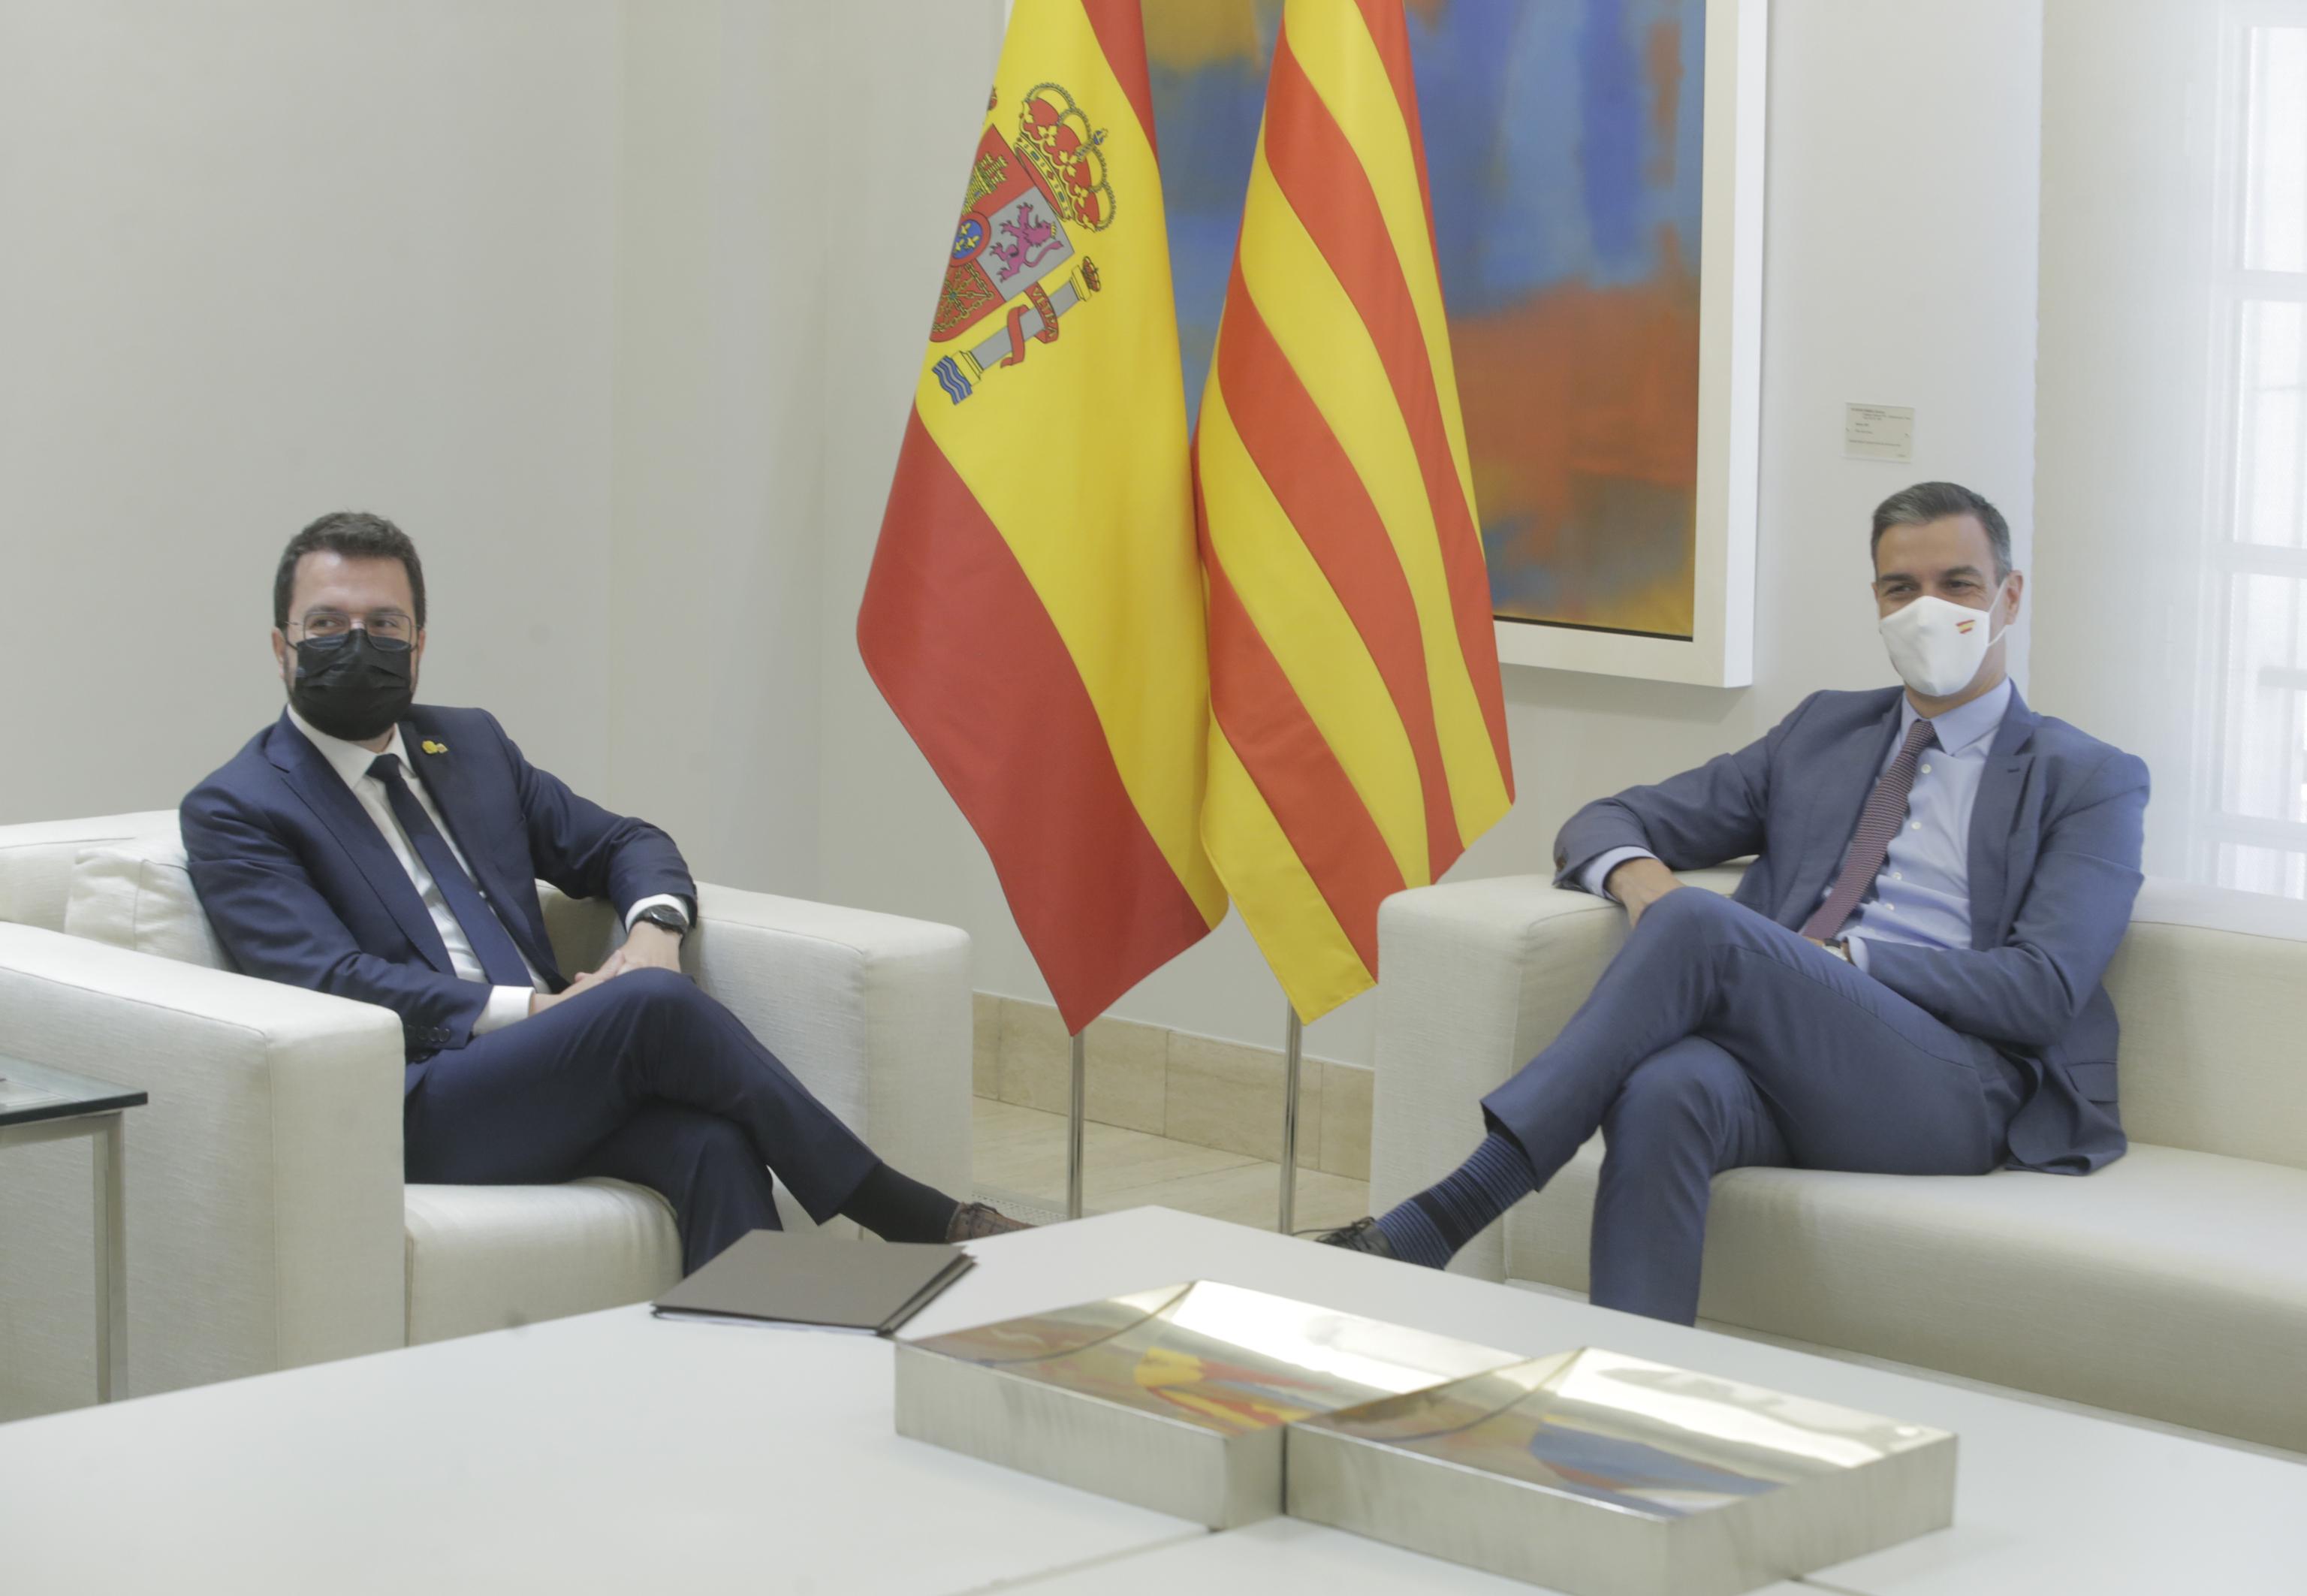 Pere Aragonès y Pedro Sánchez.